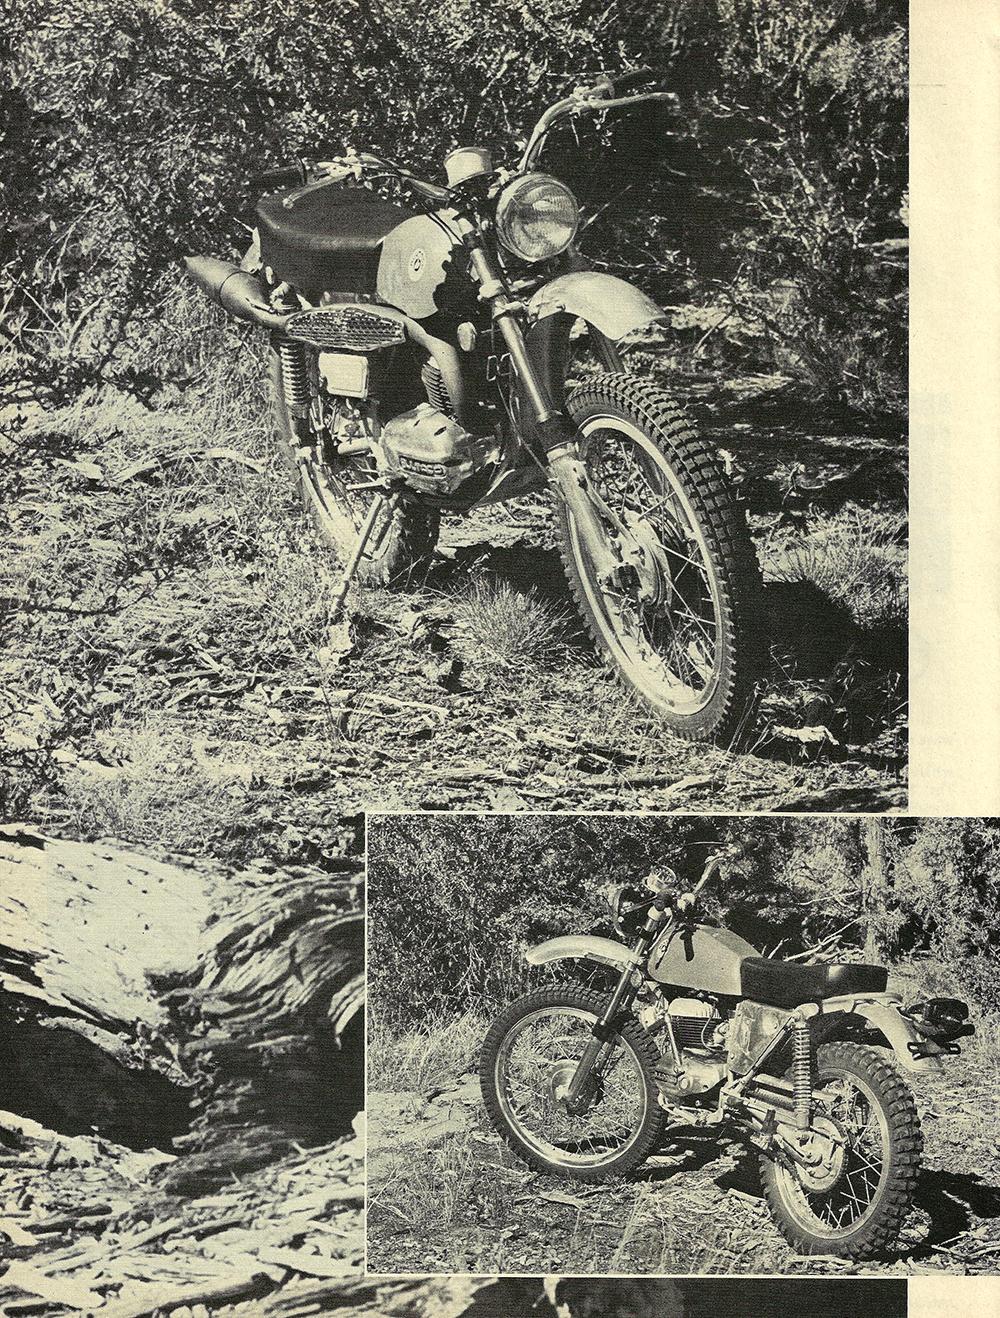 1971 Bultaco Lobito 175 road test 01.jpg